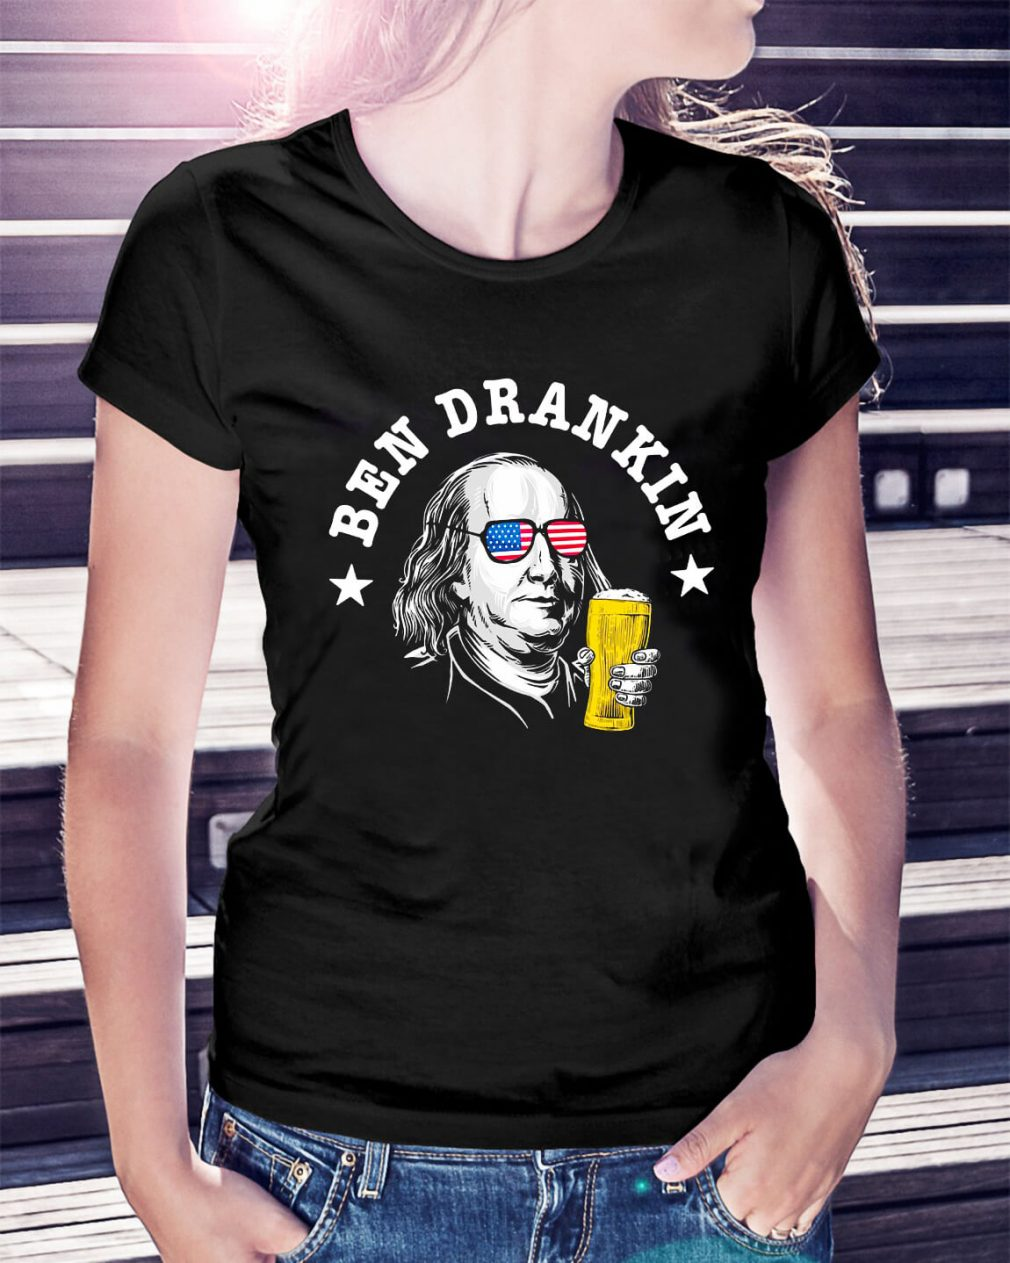 Ben Drankin 4th of July Ladies Tee